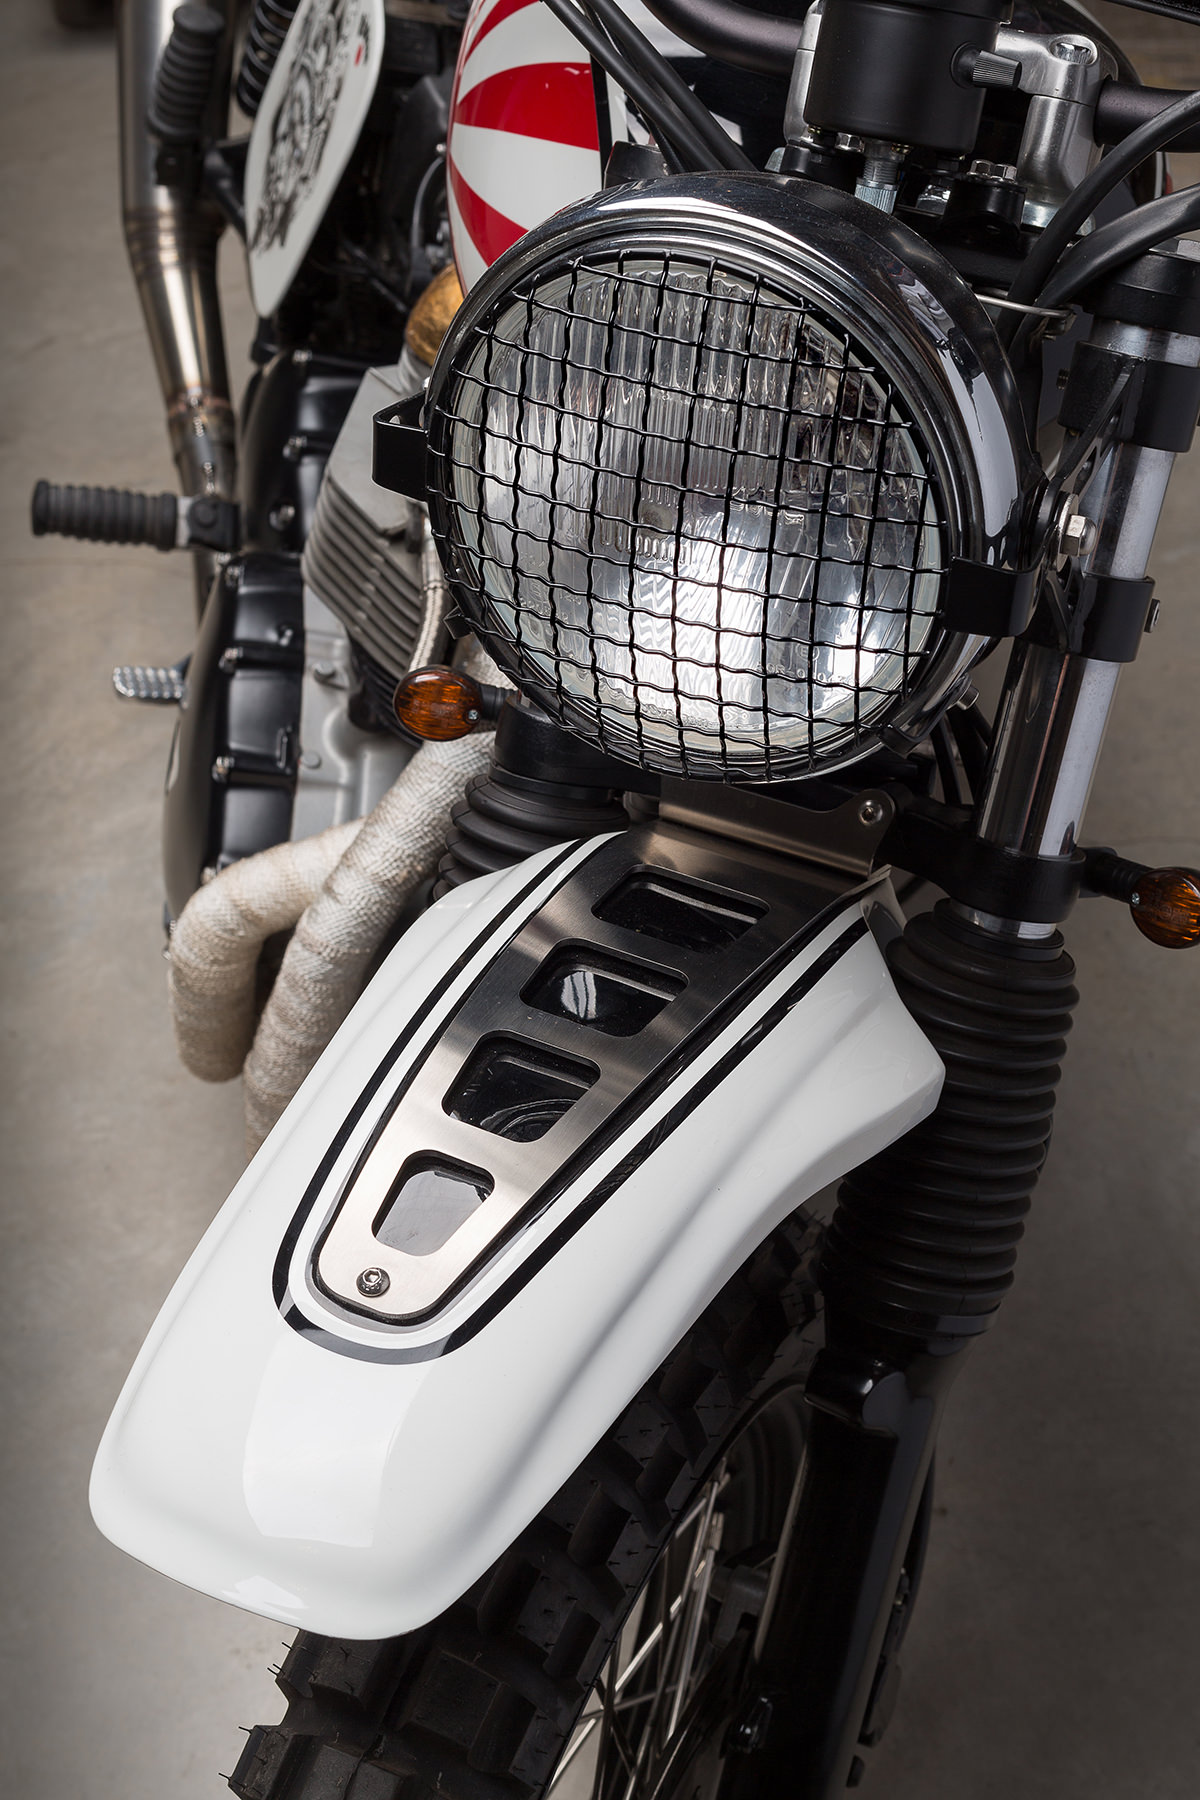 Custom Triumph Scrambler Motorcycle 8